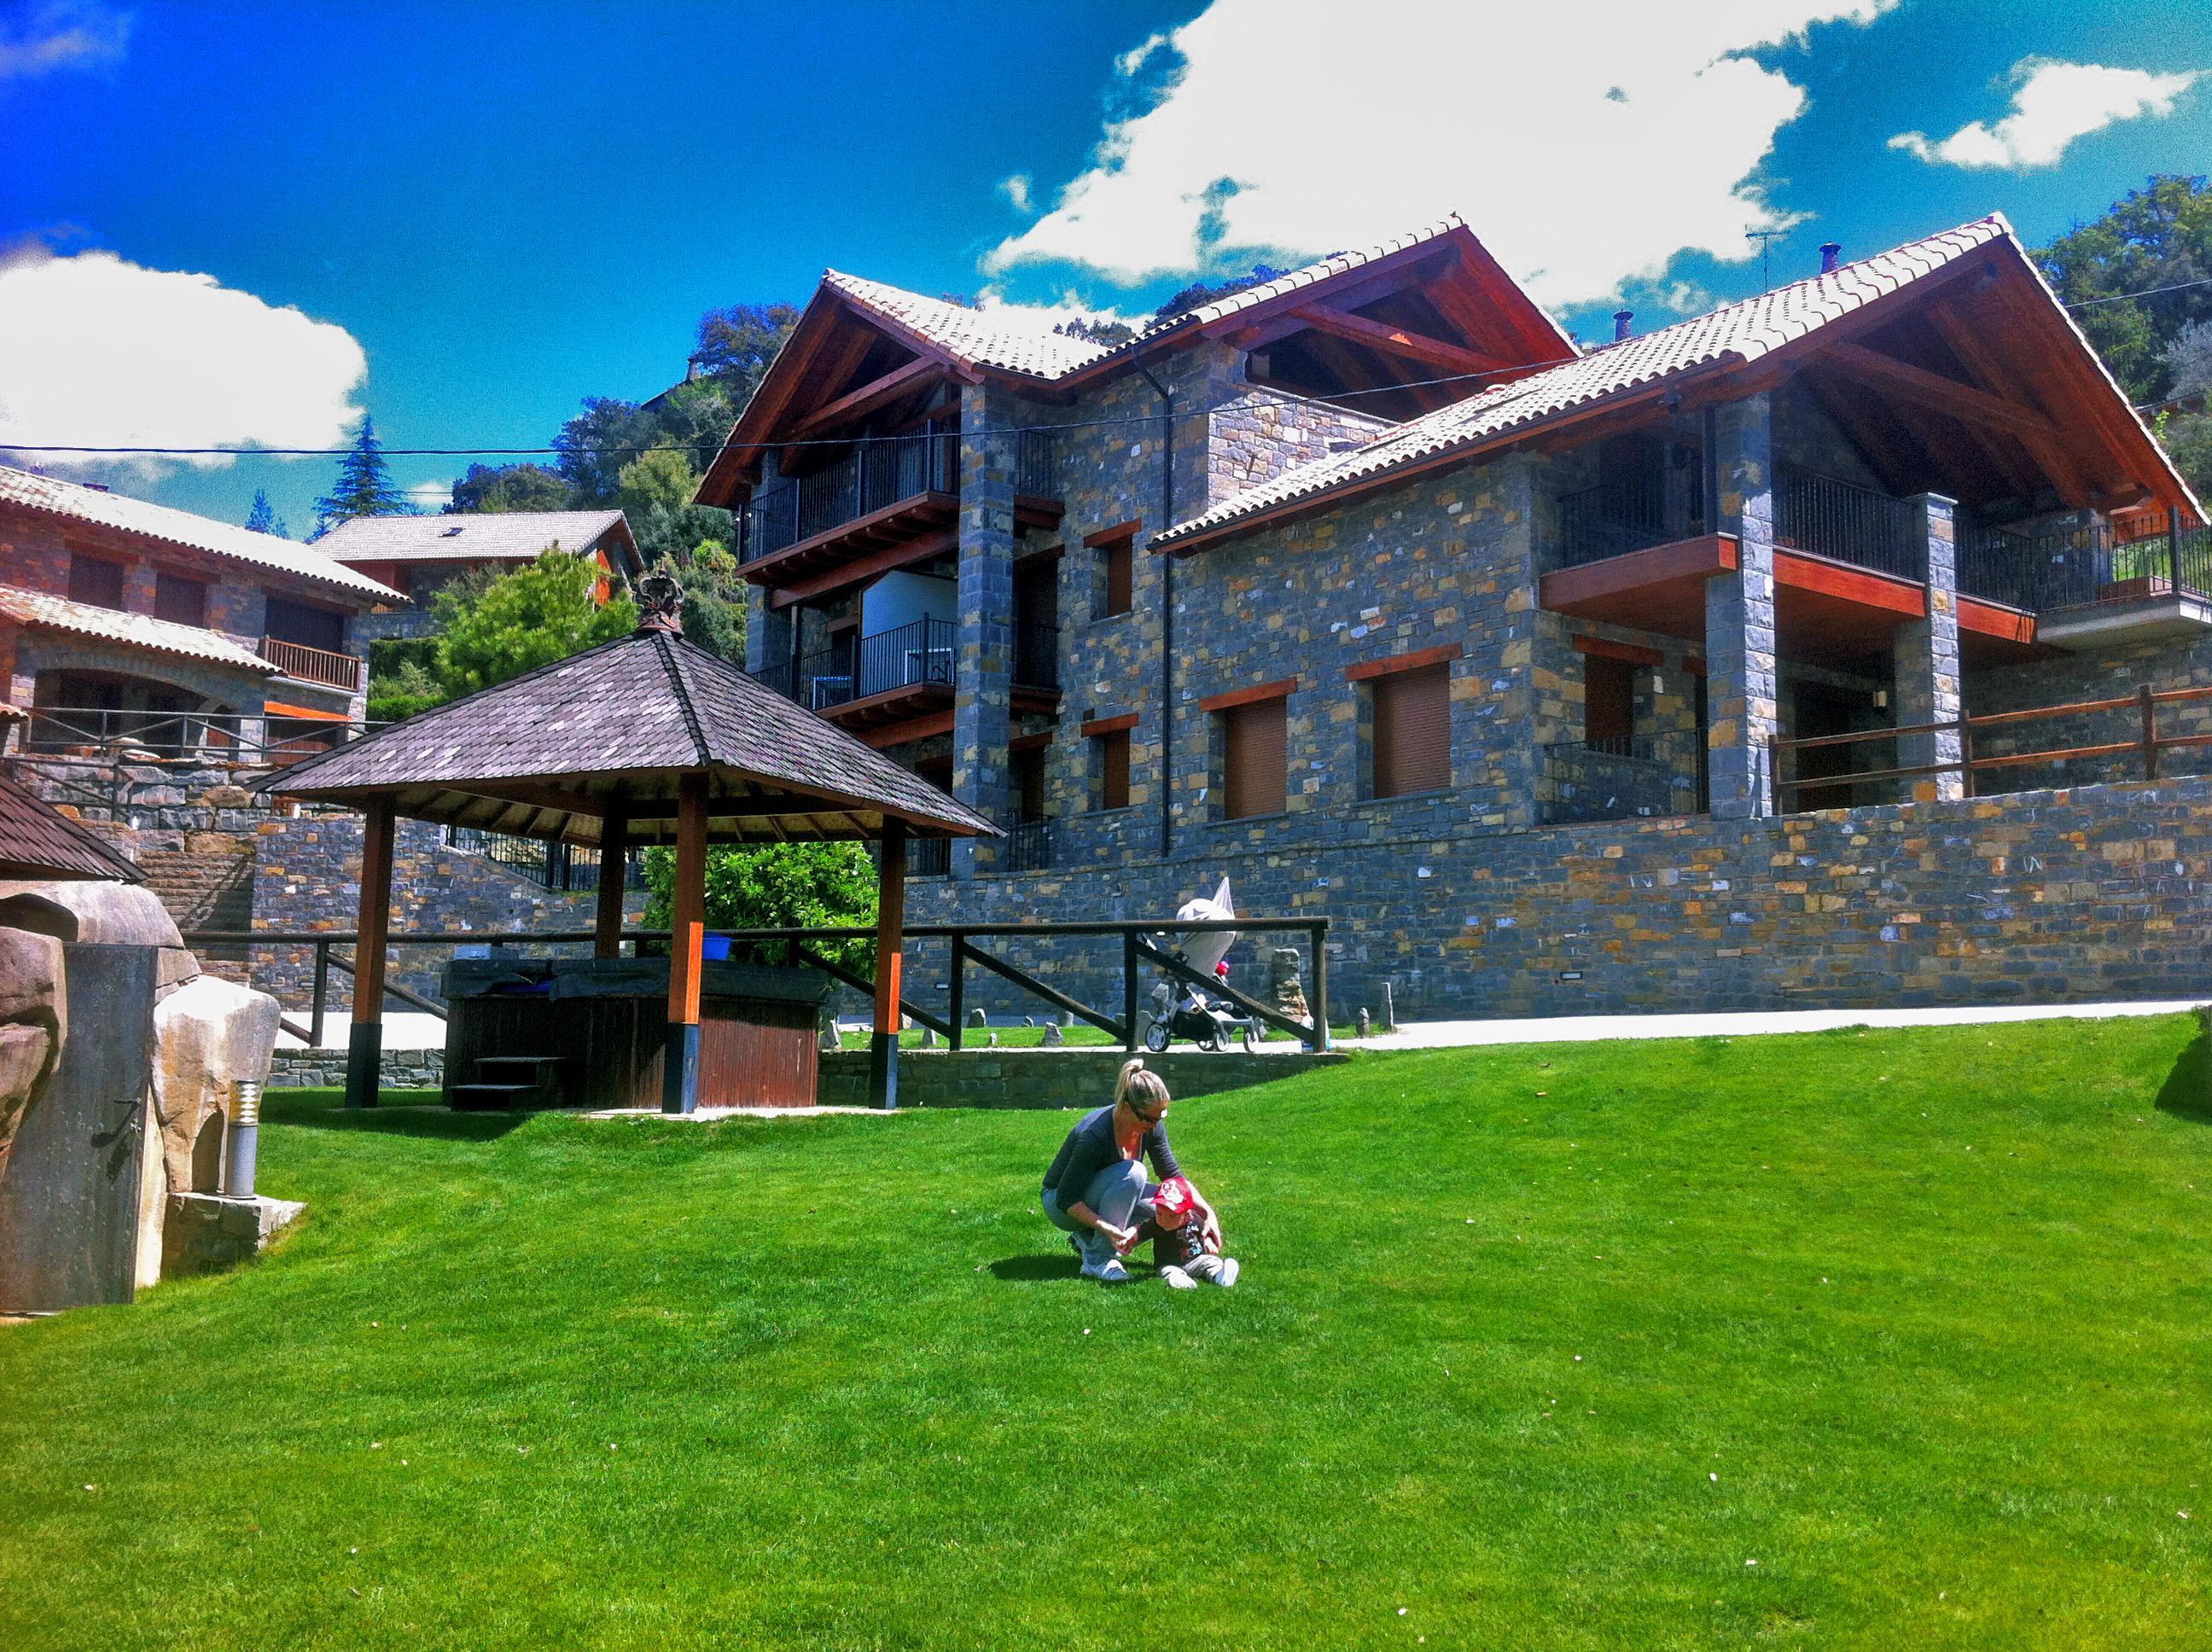 Fotos 10 casas rurales con piscina para ir con ni os for Casas rurales en caceres con piscina